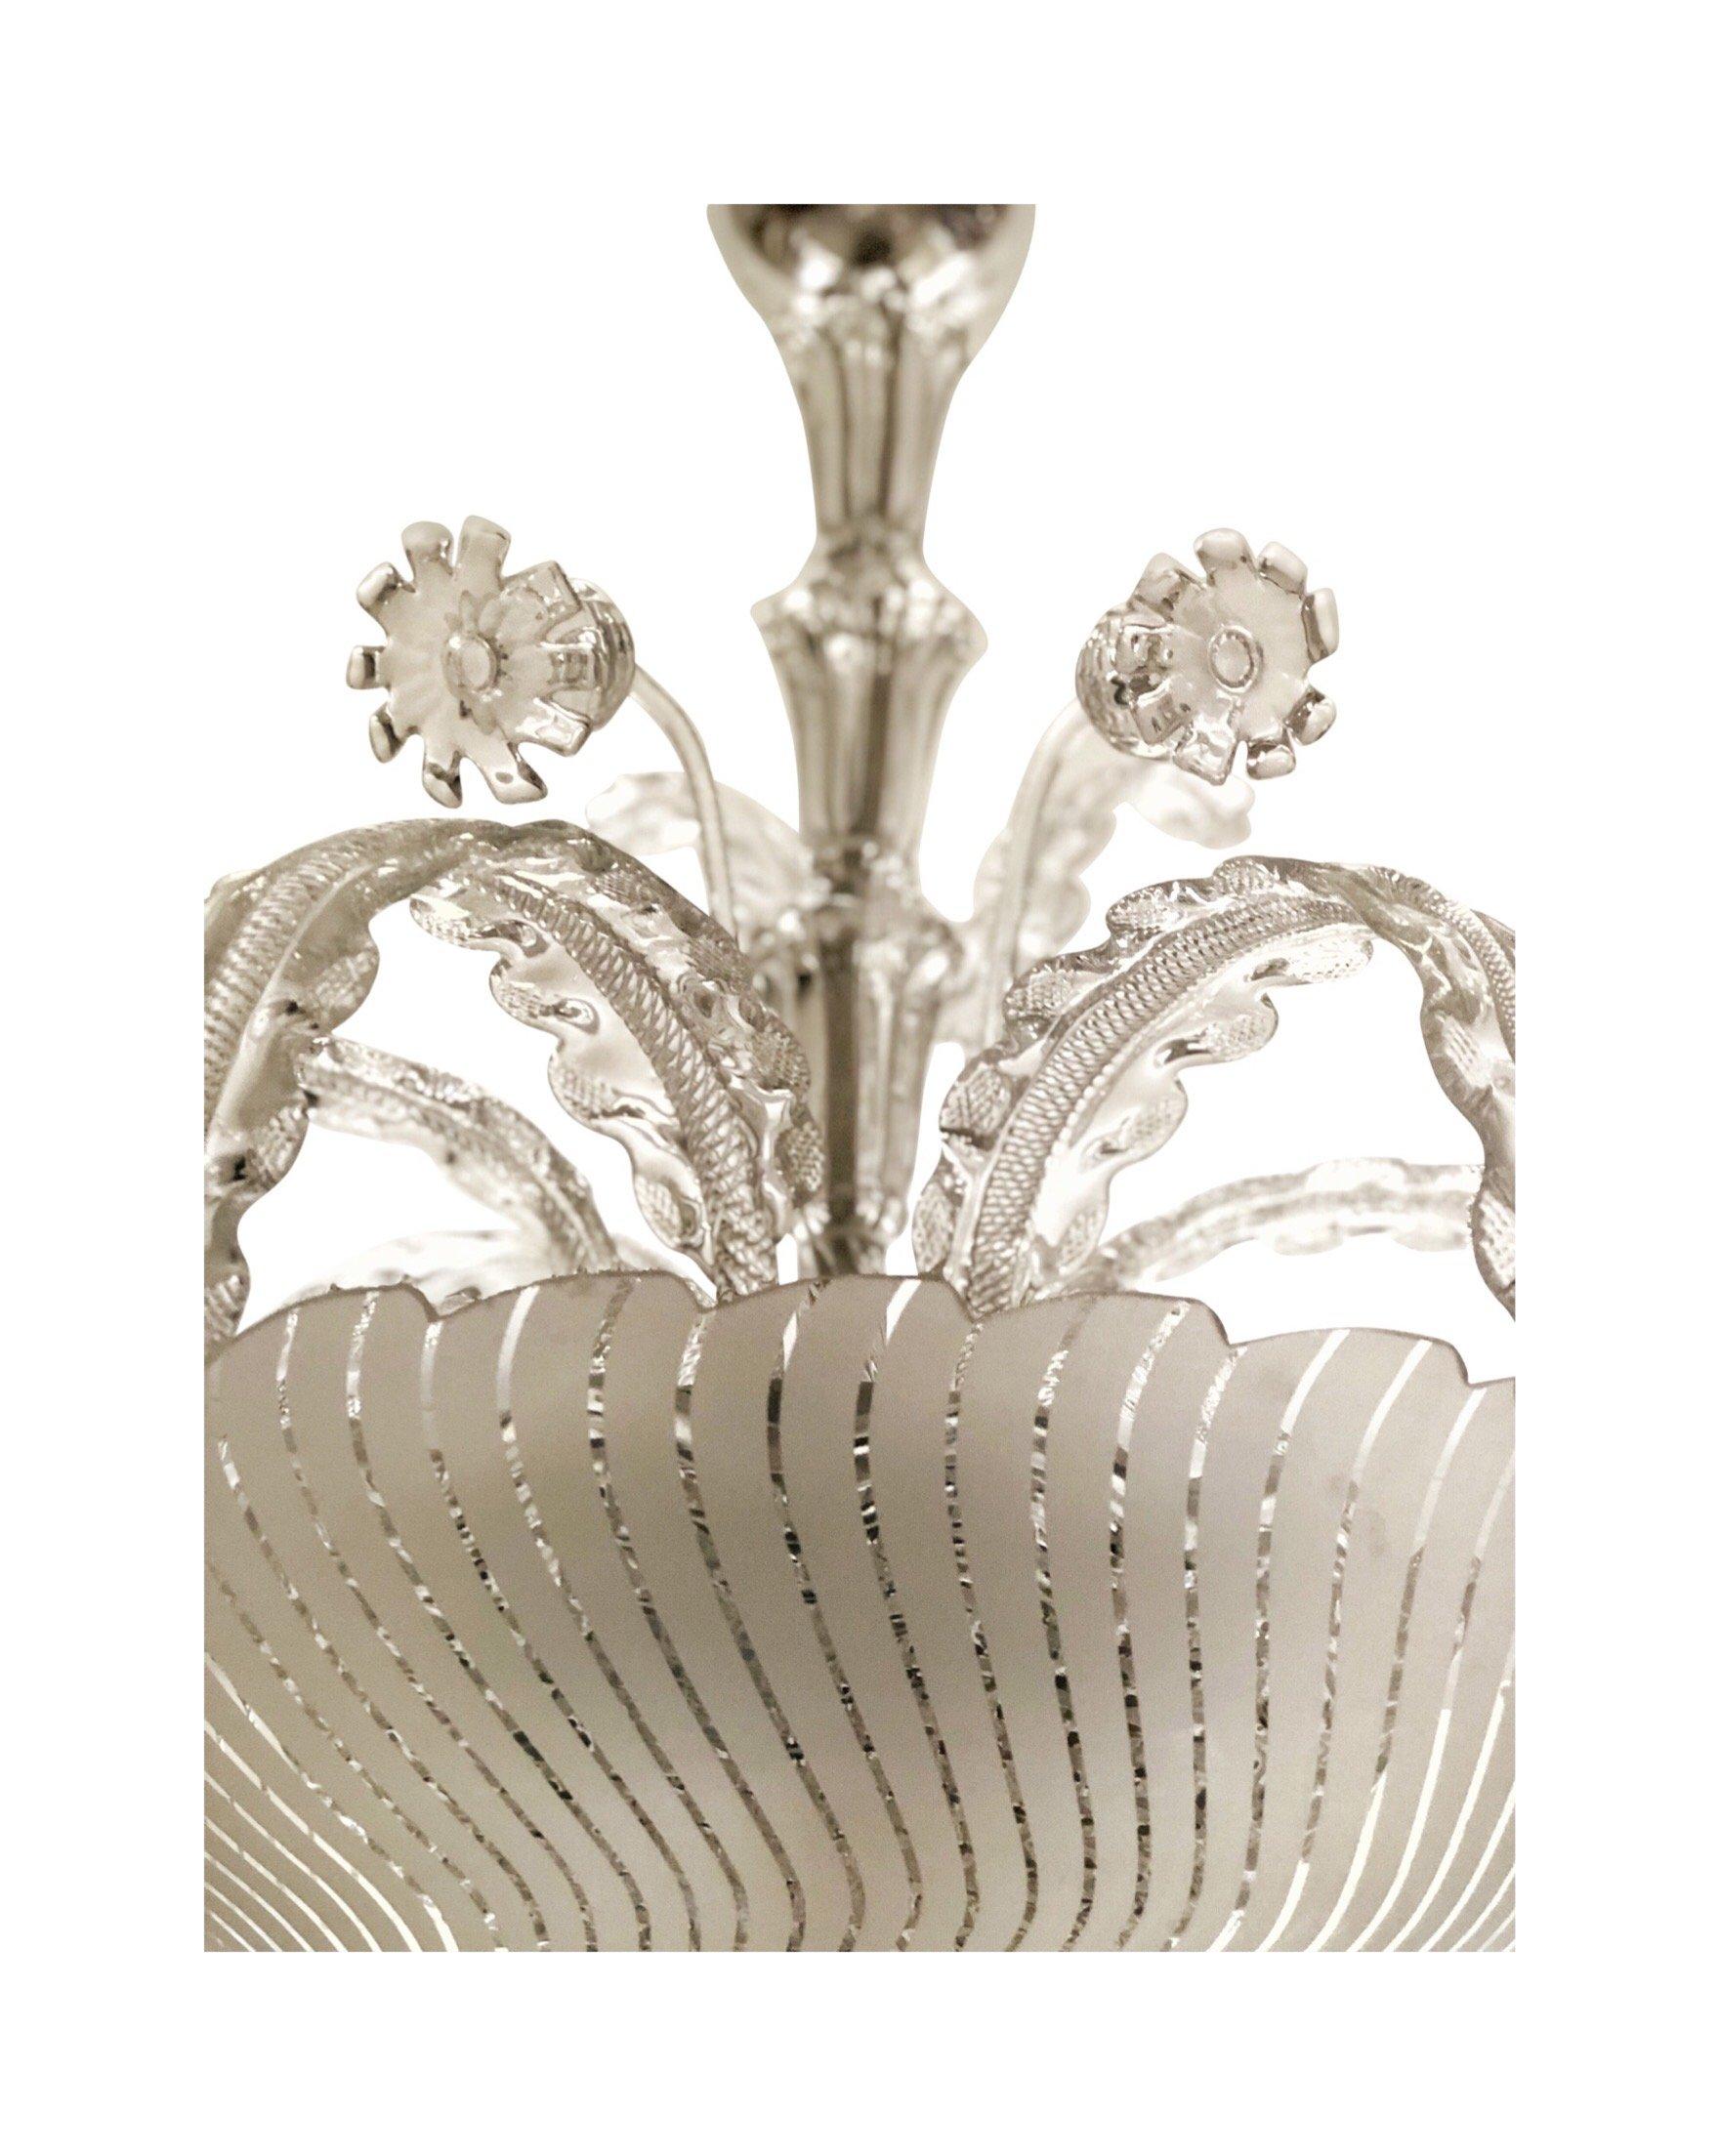 Orrefors Venetian Style Chandelier, attributed Fritz Kurz